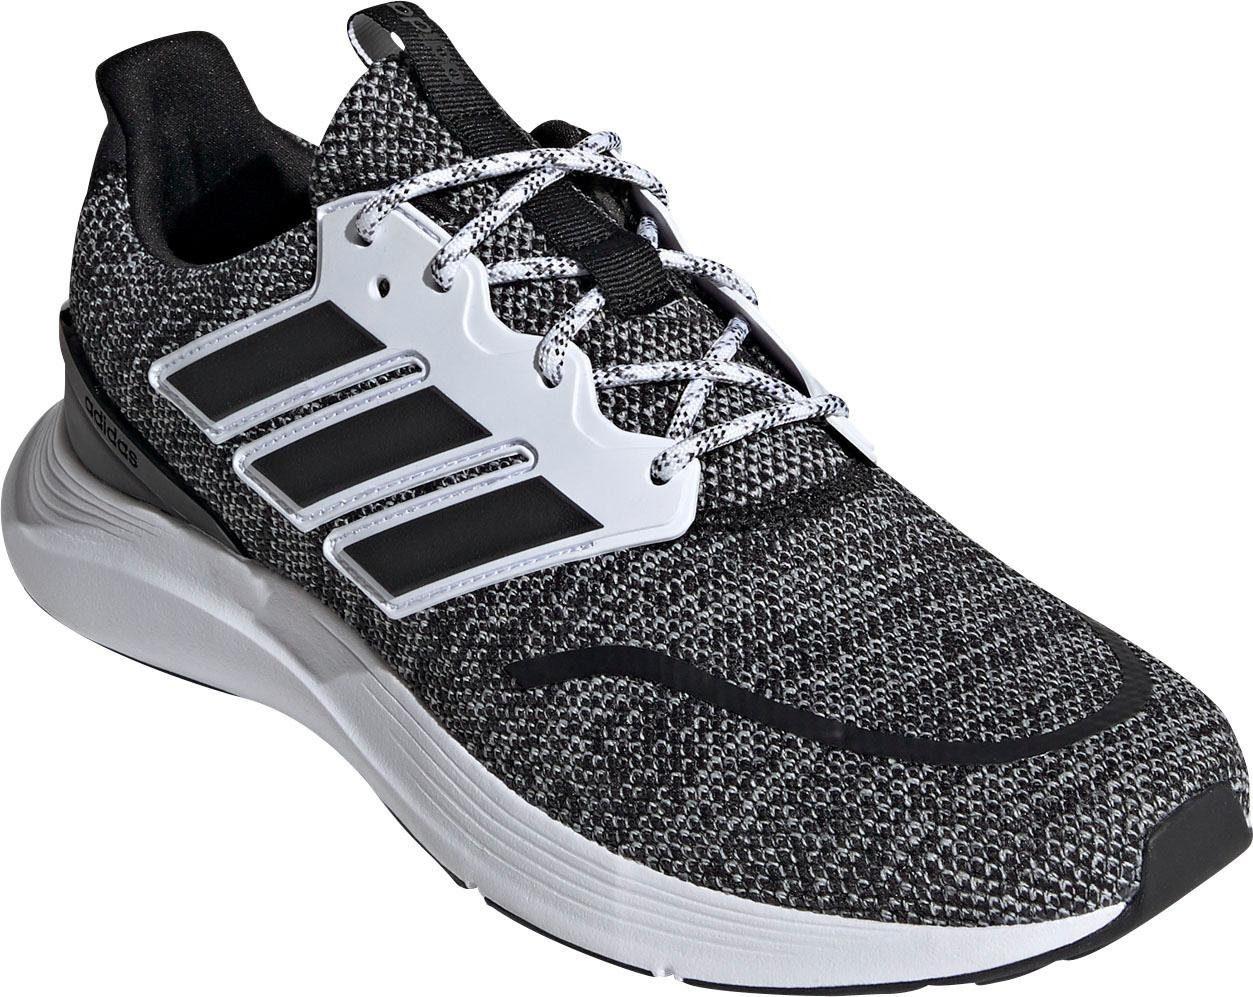 adidas Laufschuh ENERG YFALCON Herrenmode/Schuhe/Komfortschuhe/Schnürschuhe